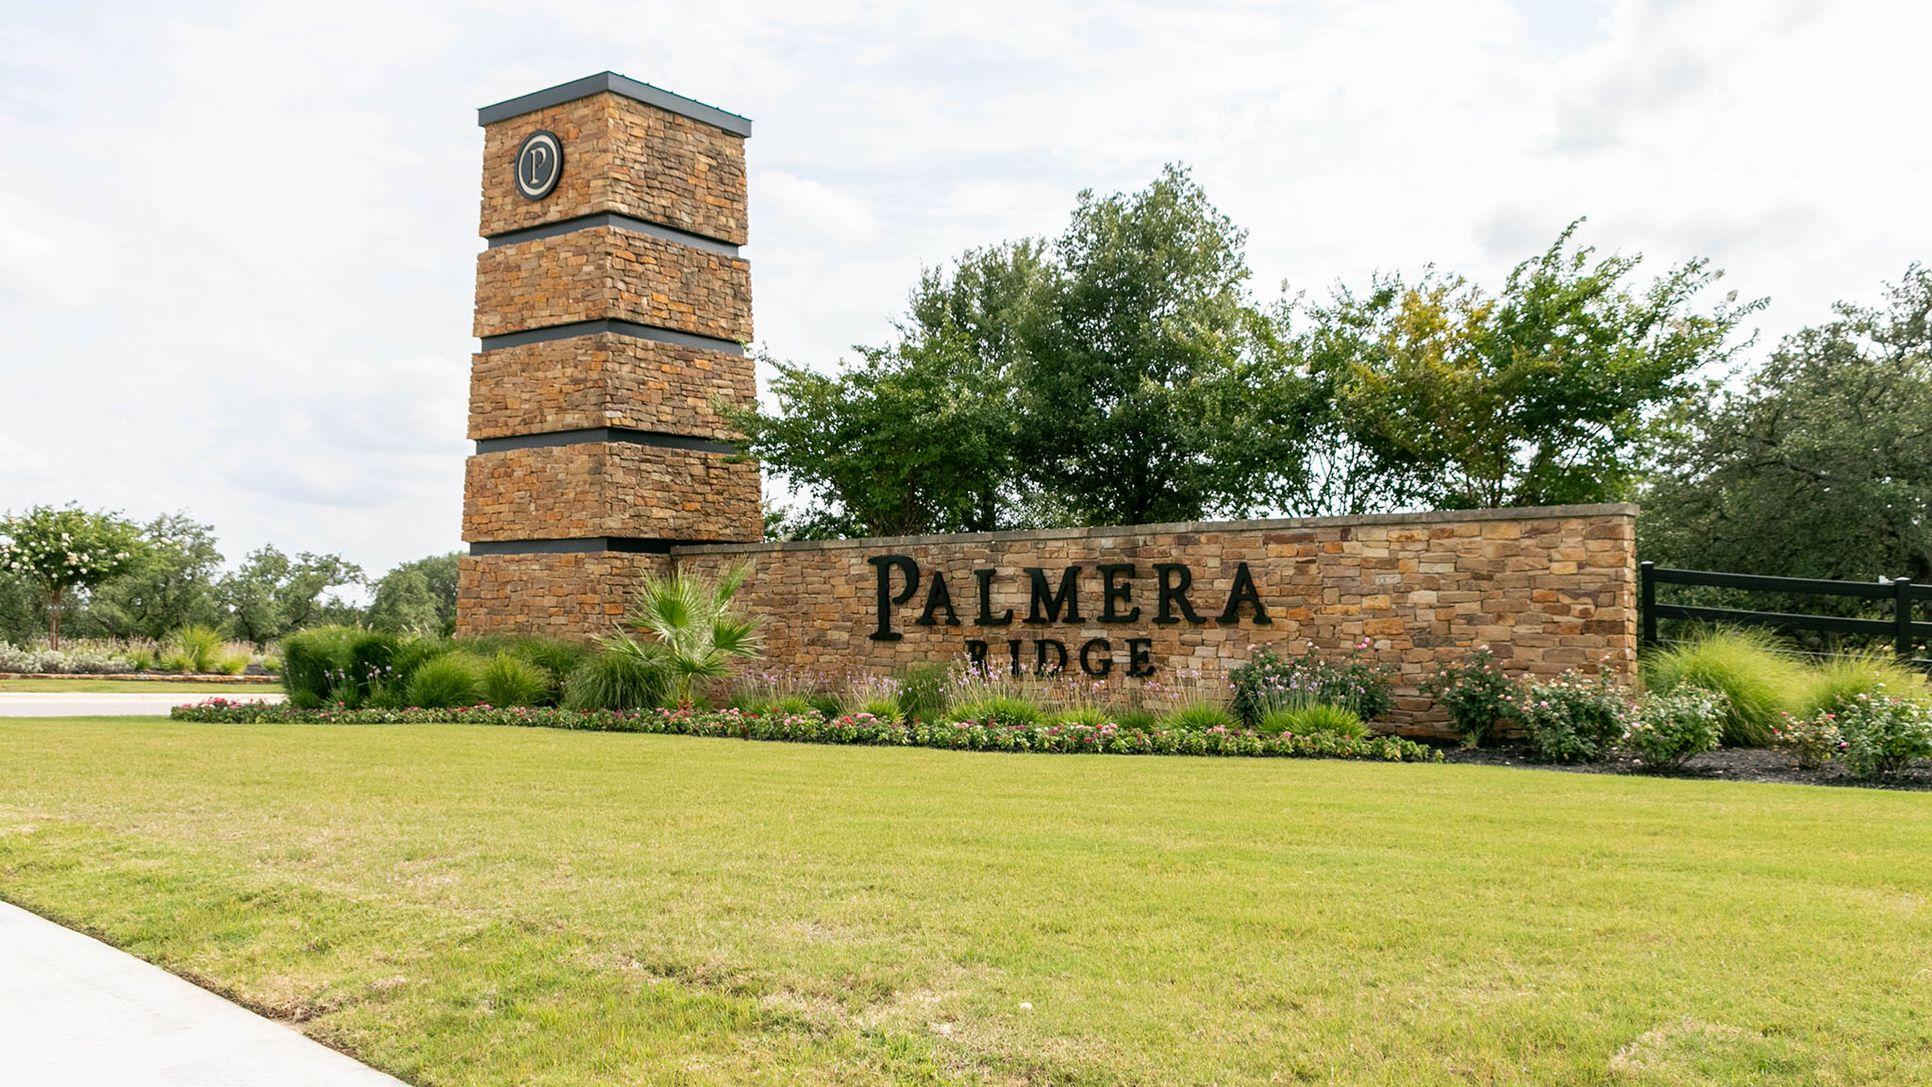 Palmera Ridge 50',78641